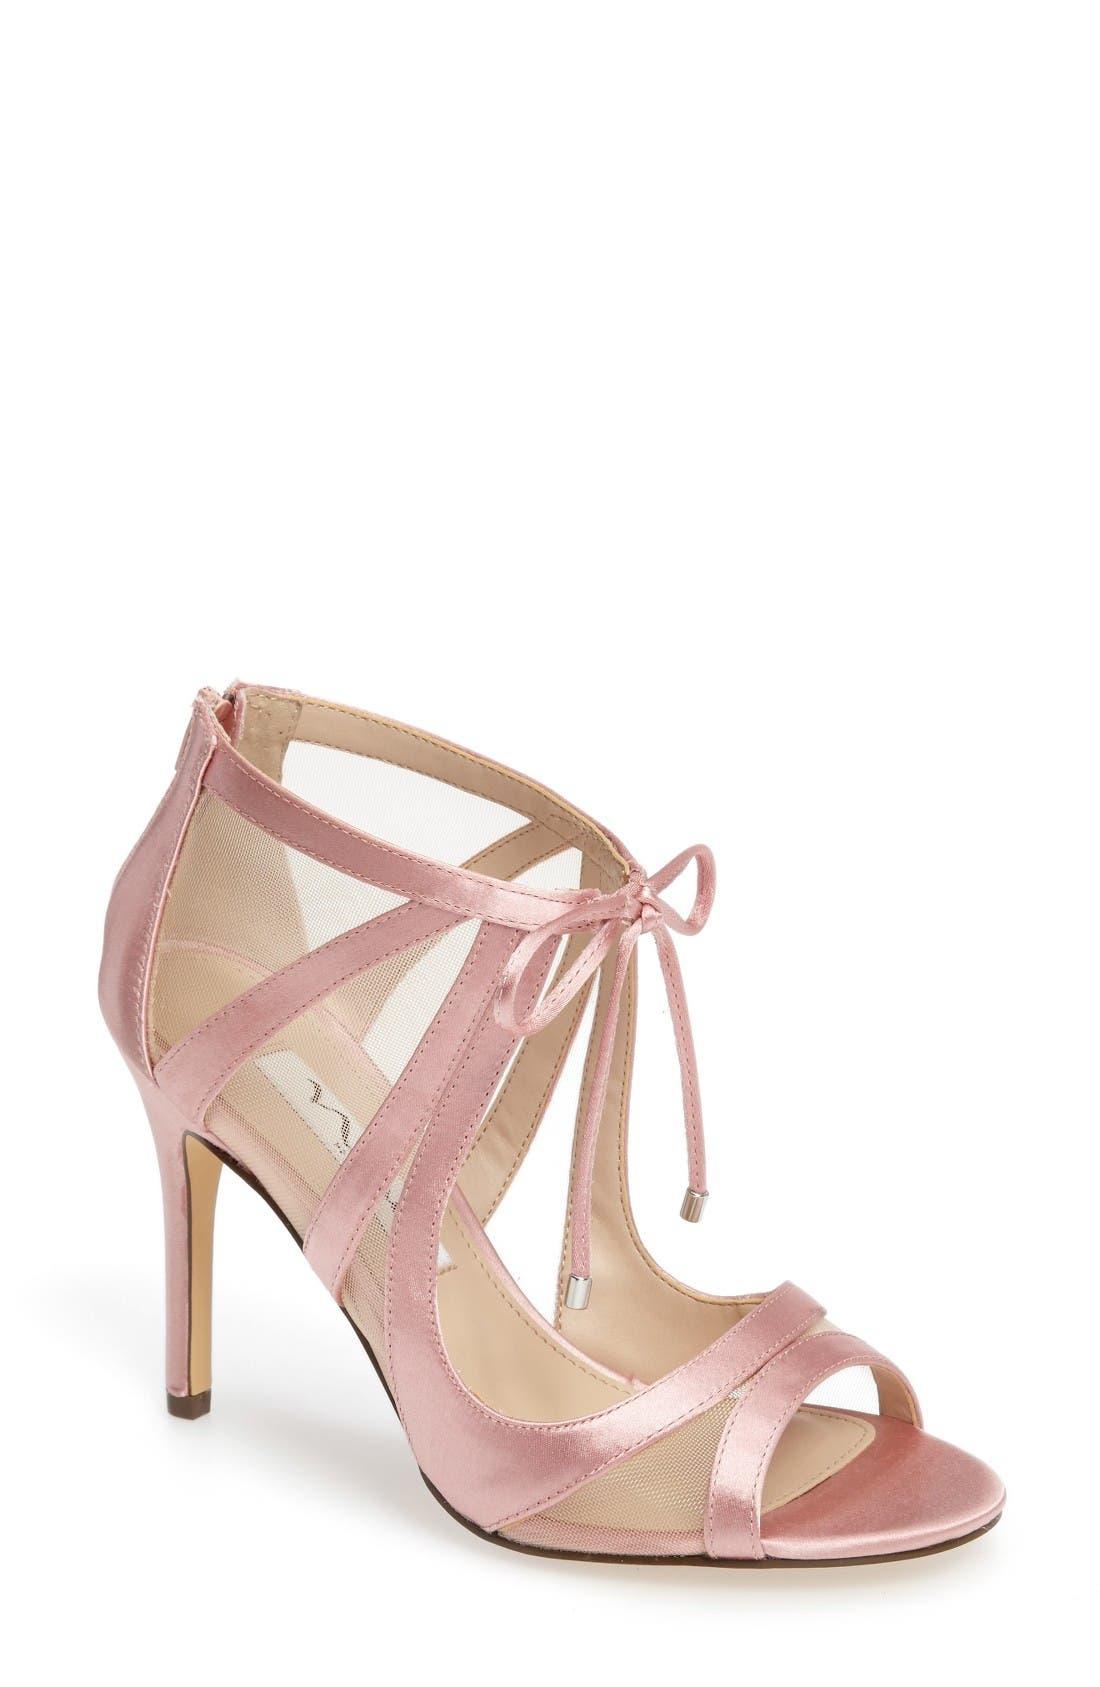 Alternate Image 1 Selected - Nina Cherie Illusion Sandal (Women)